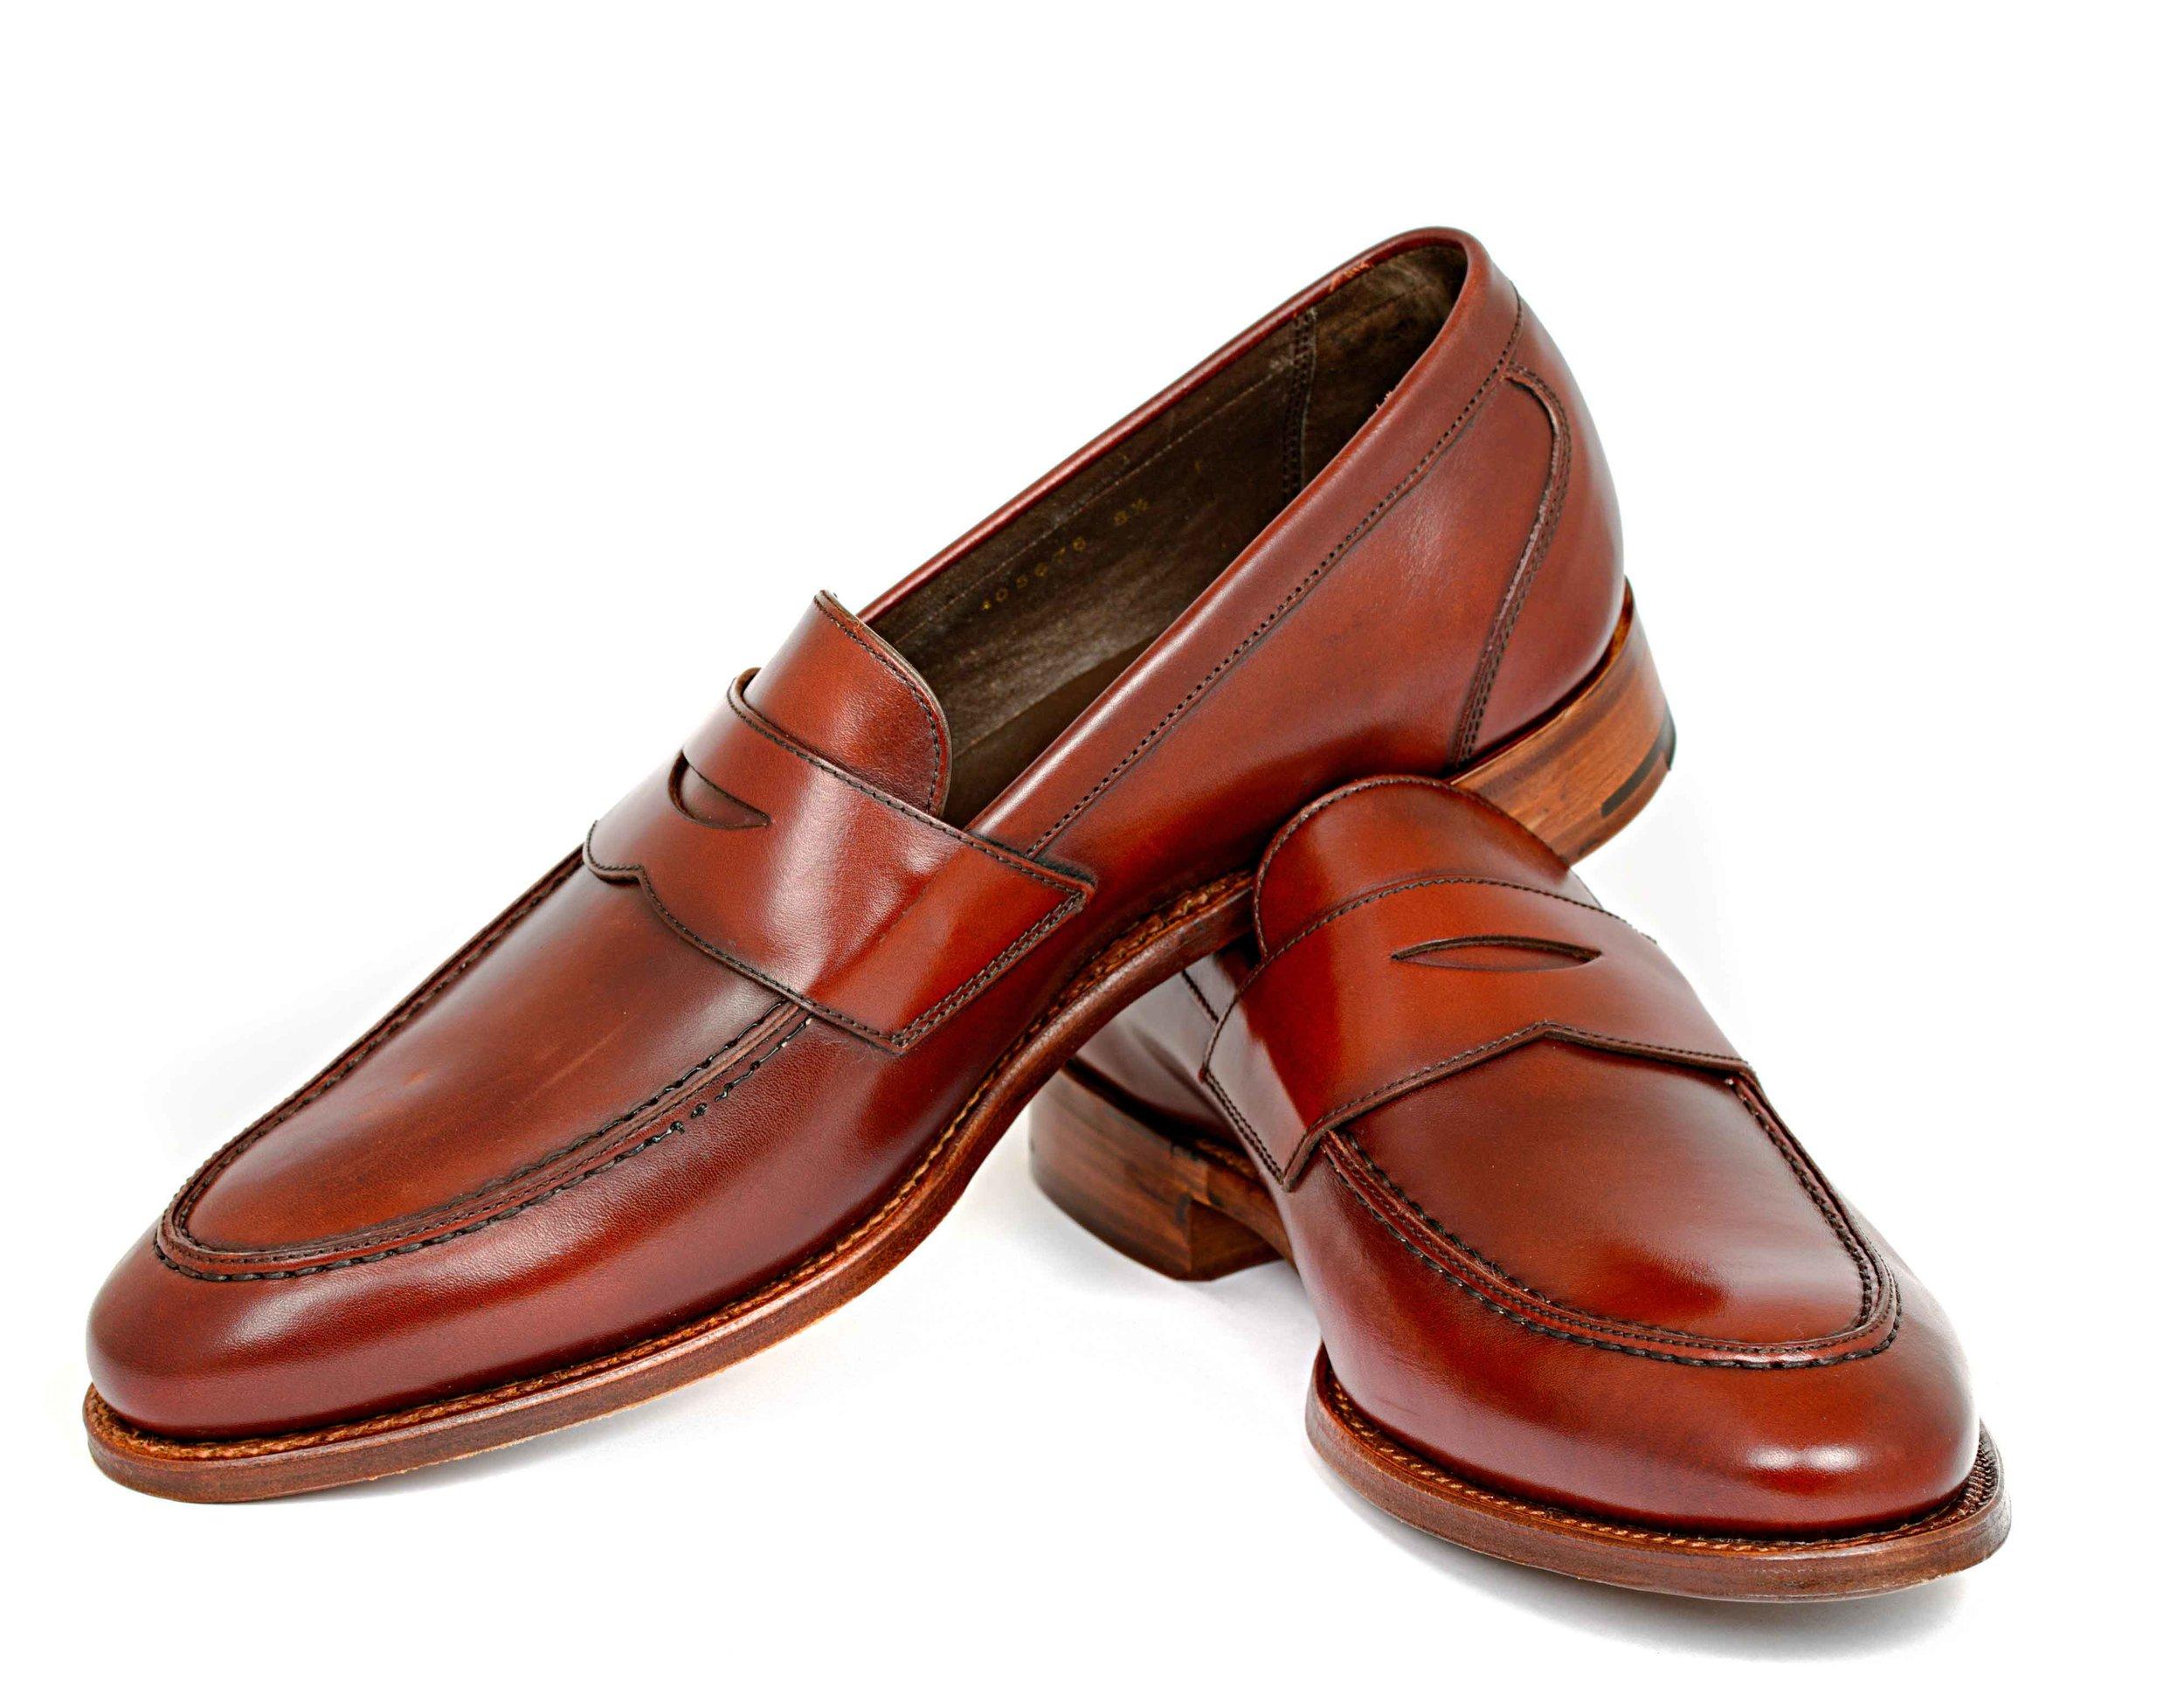 Loafer-mokassin-shoes---mokasiny-boty.jpg